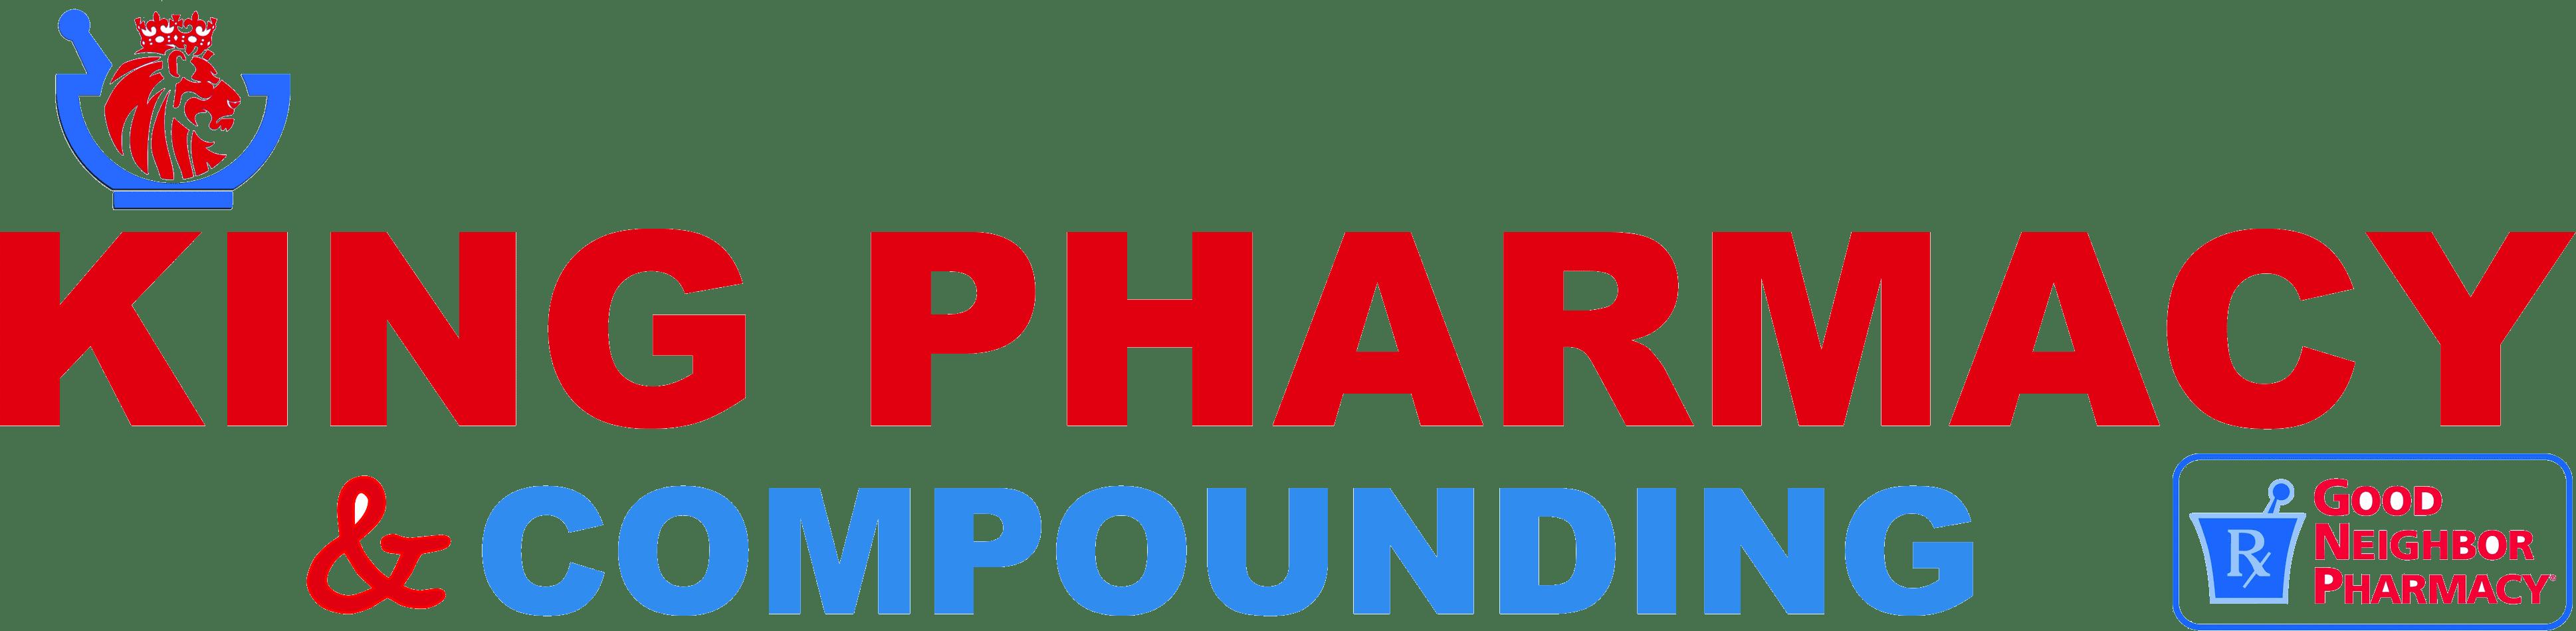 King Pharmacy & Compounding